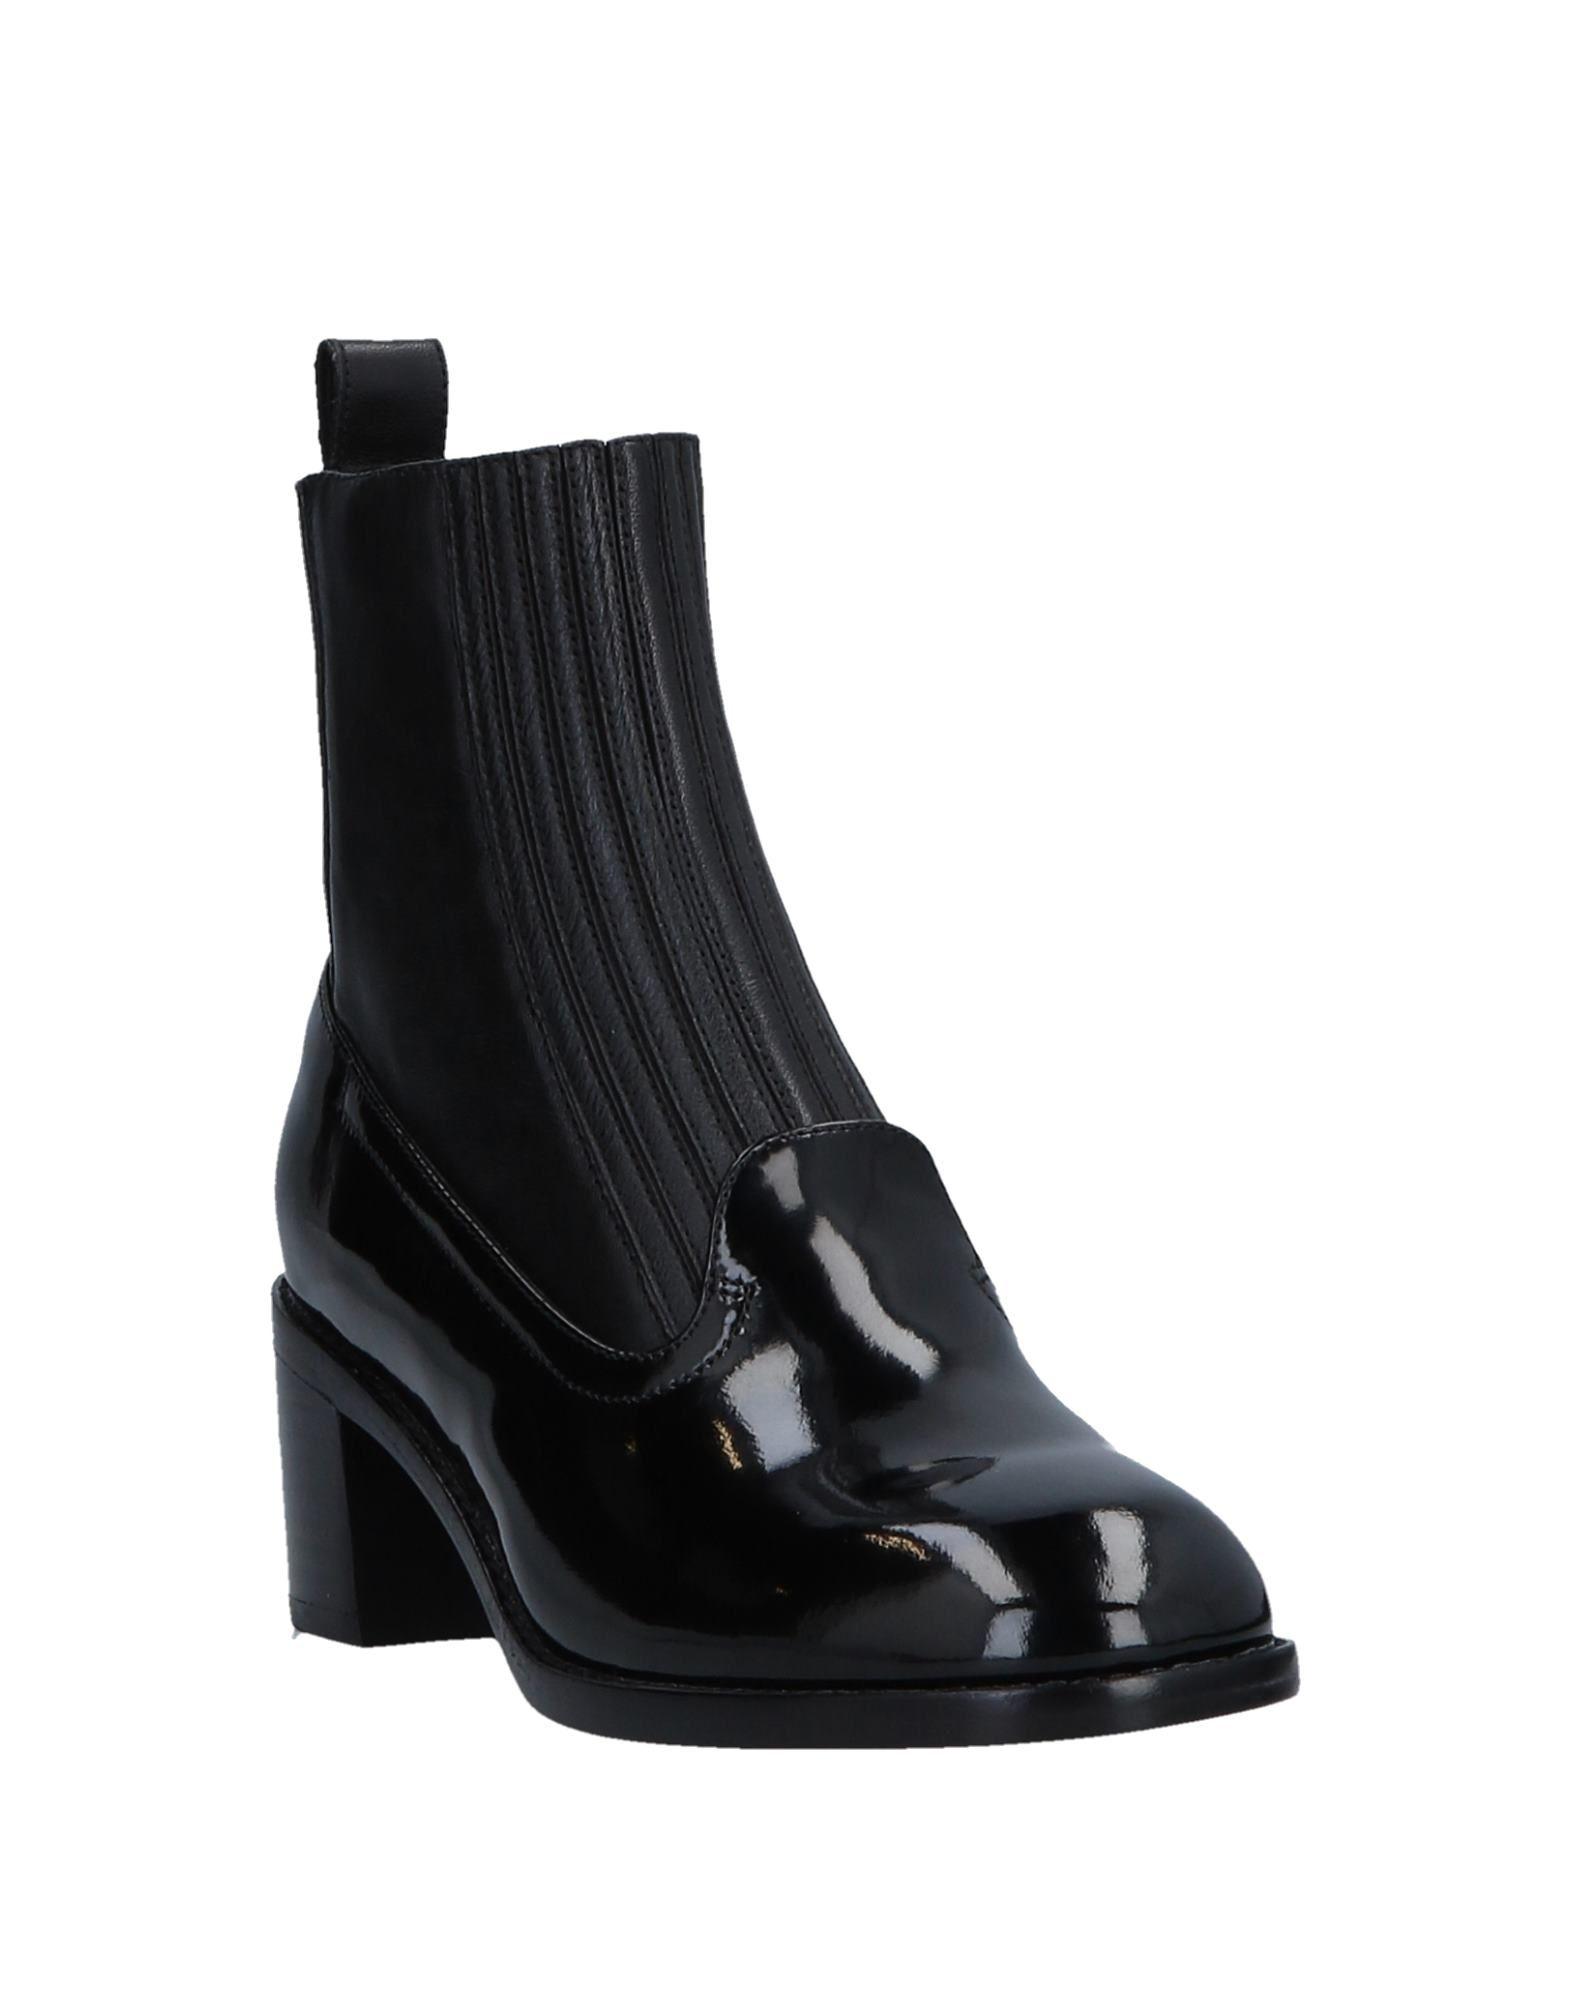 Opening Ceremony Chelsea Boots Damen  11515171HWGut 11515171HWGut 11515171HWGut aussehende strapazierfähige Schuhe d5f2a3